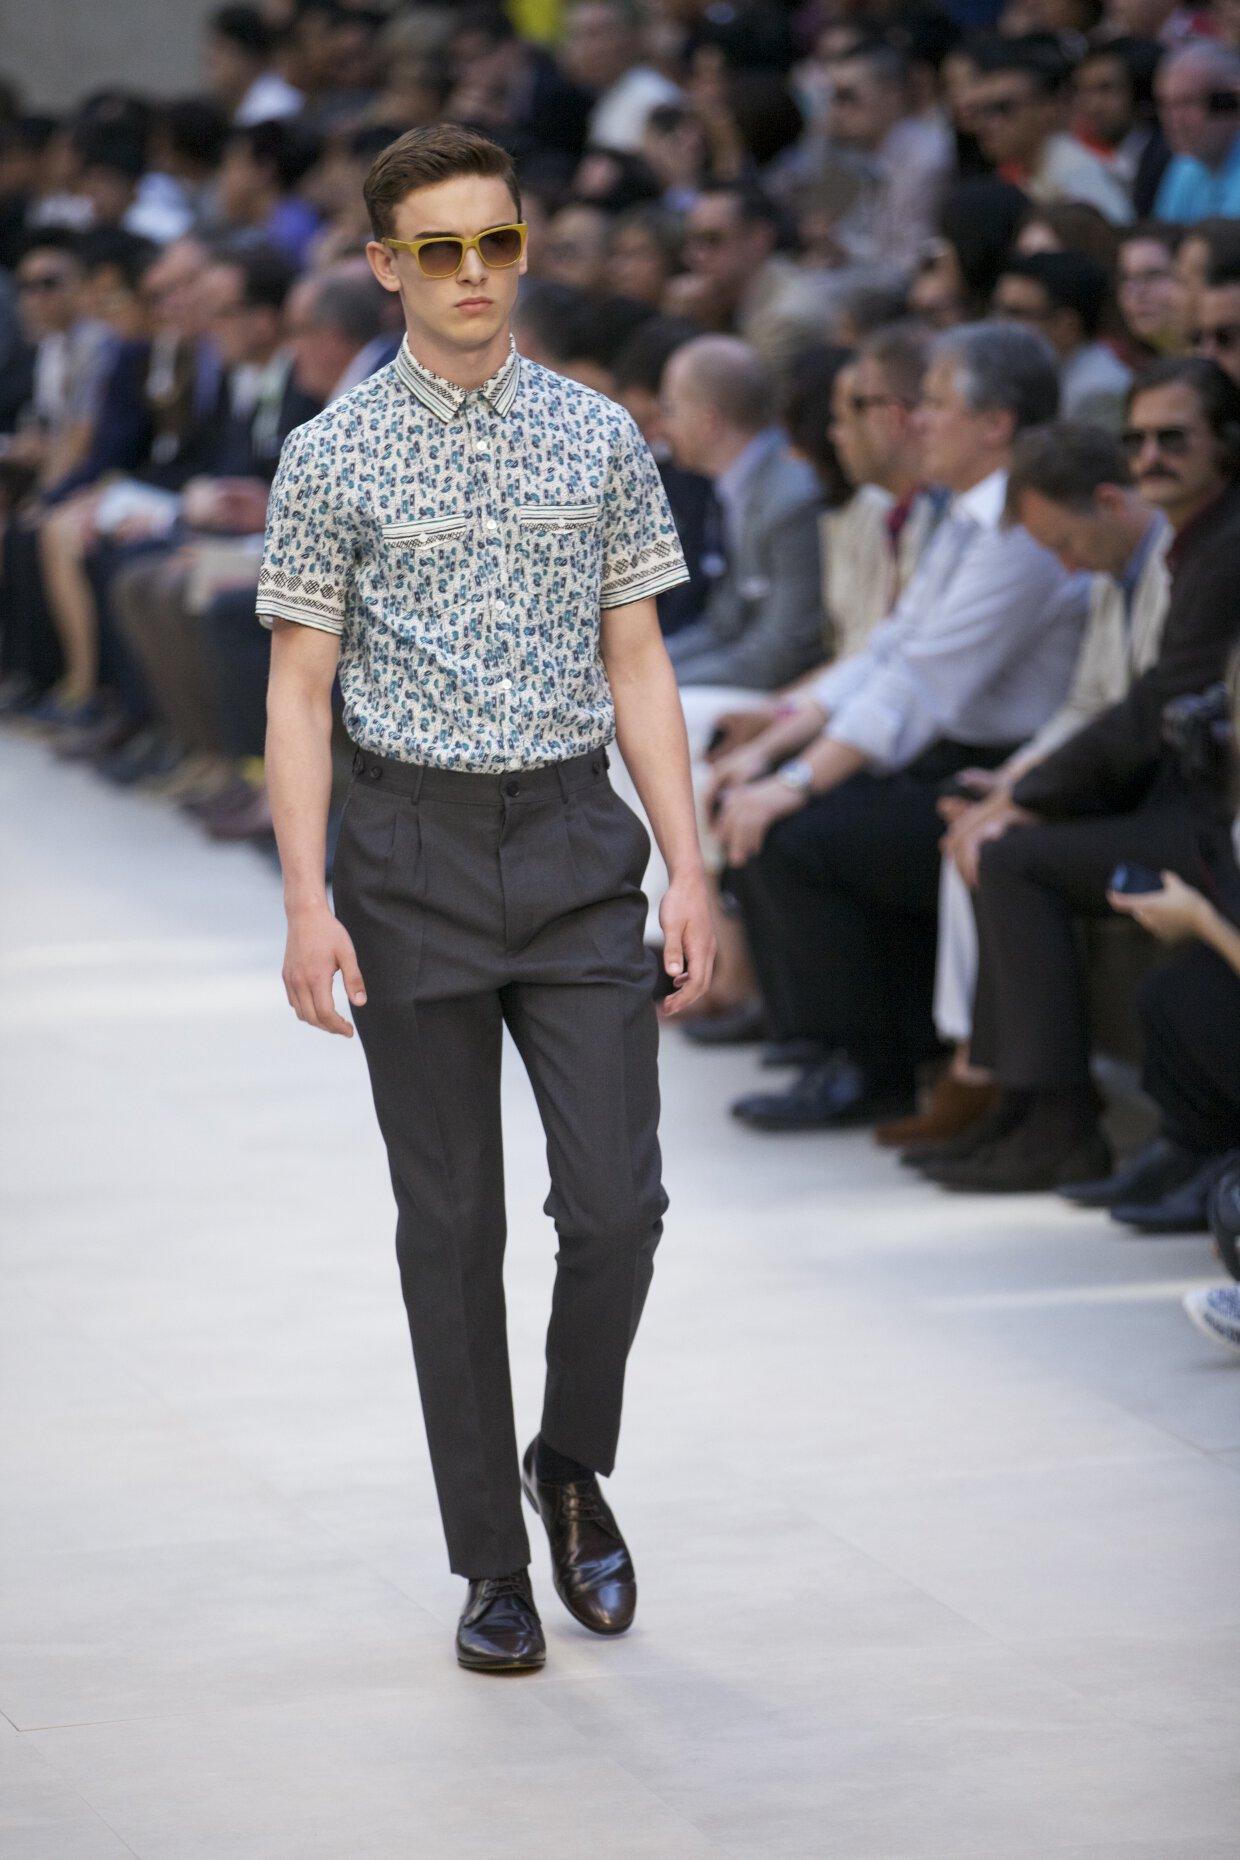 Spring Summer 2013 Fashion Men s Collection Burberry Prorsum